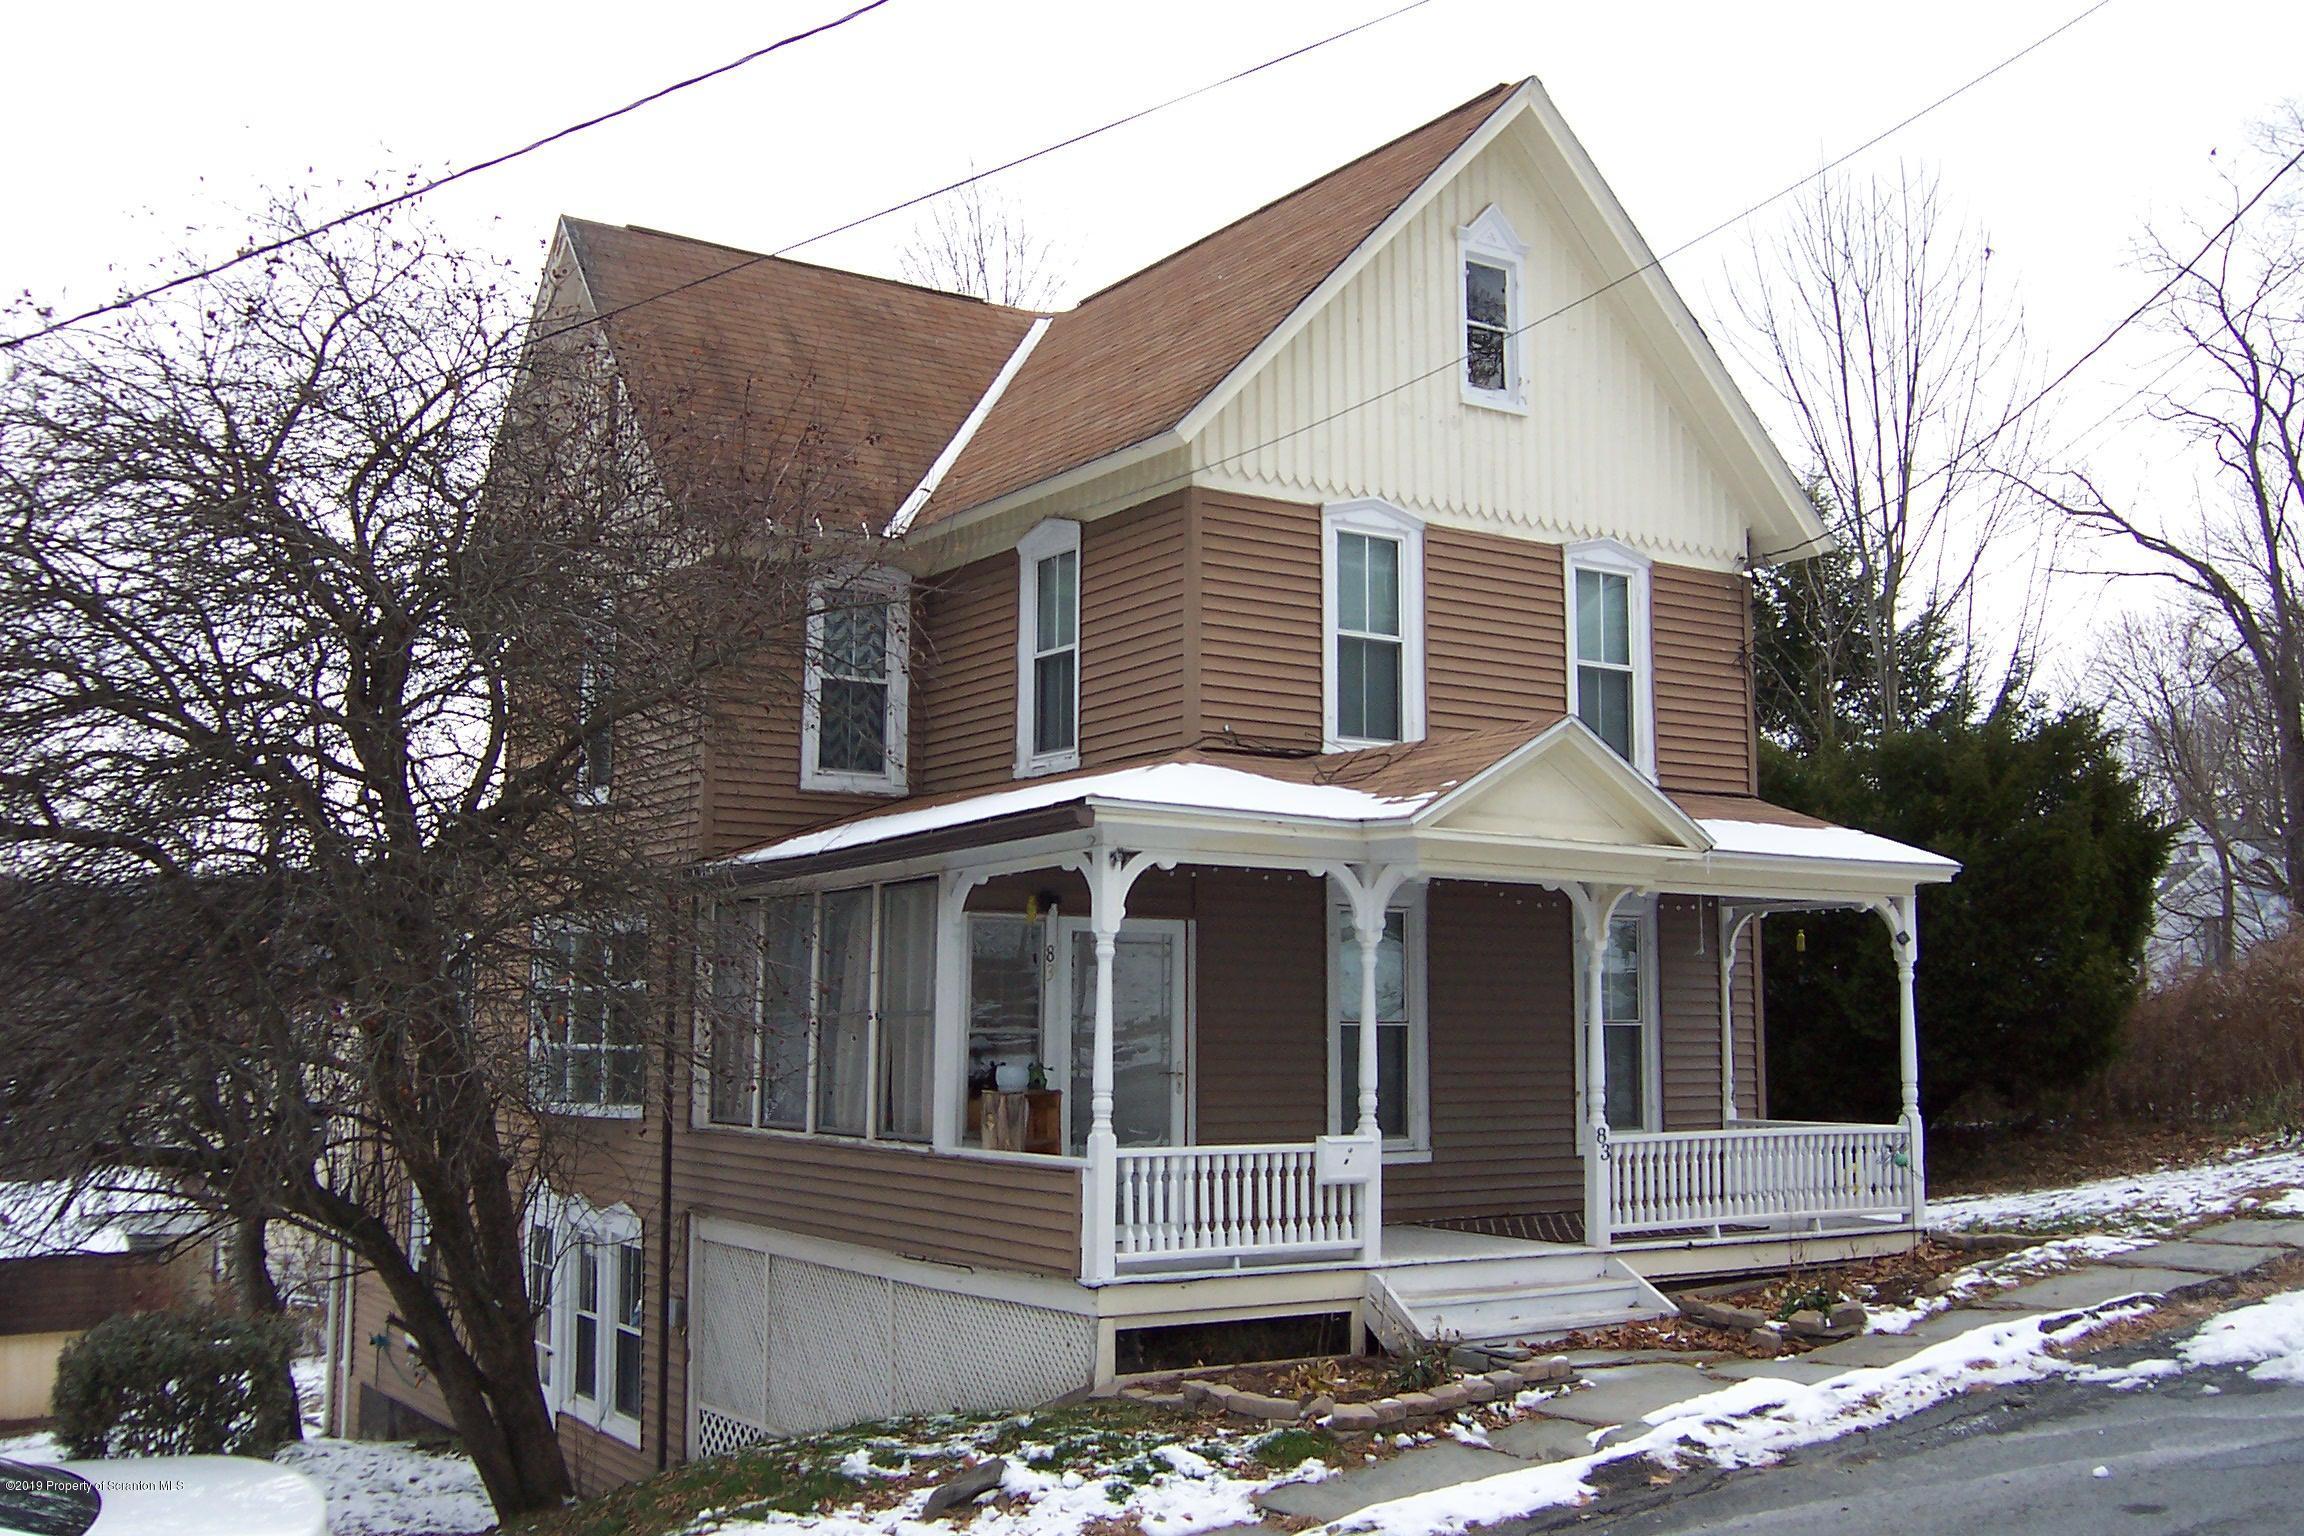 83 Pine Street, Susquehanna, Pennsylvania 18847, 4 Bedrooms Bedrooms, 7 Rooms Rooms,2 BathroomsBathrooms,Single Family,For Sale,Pine Street,19-5421